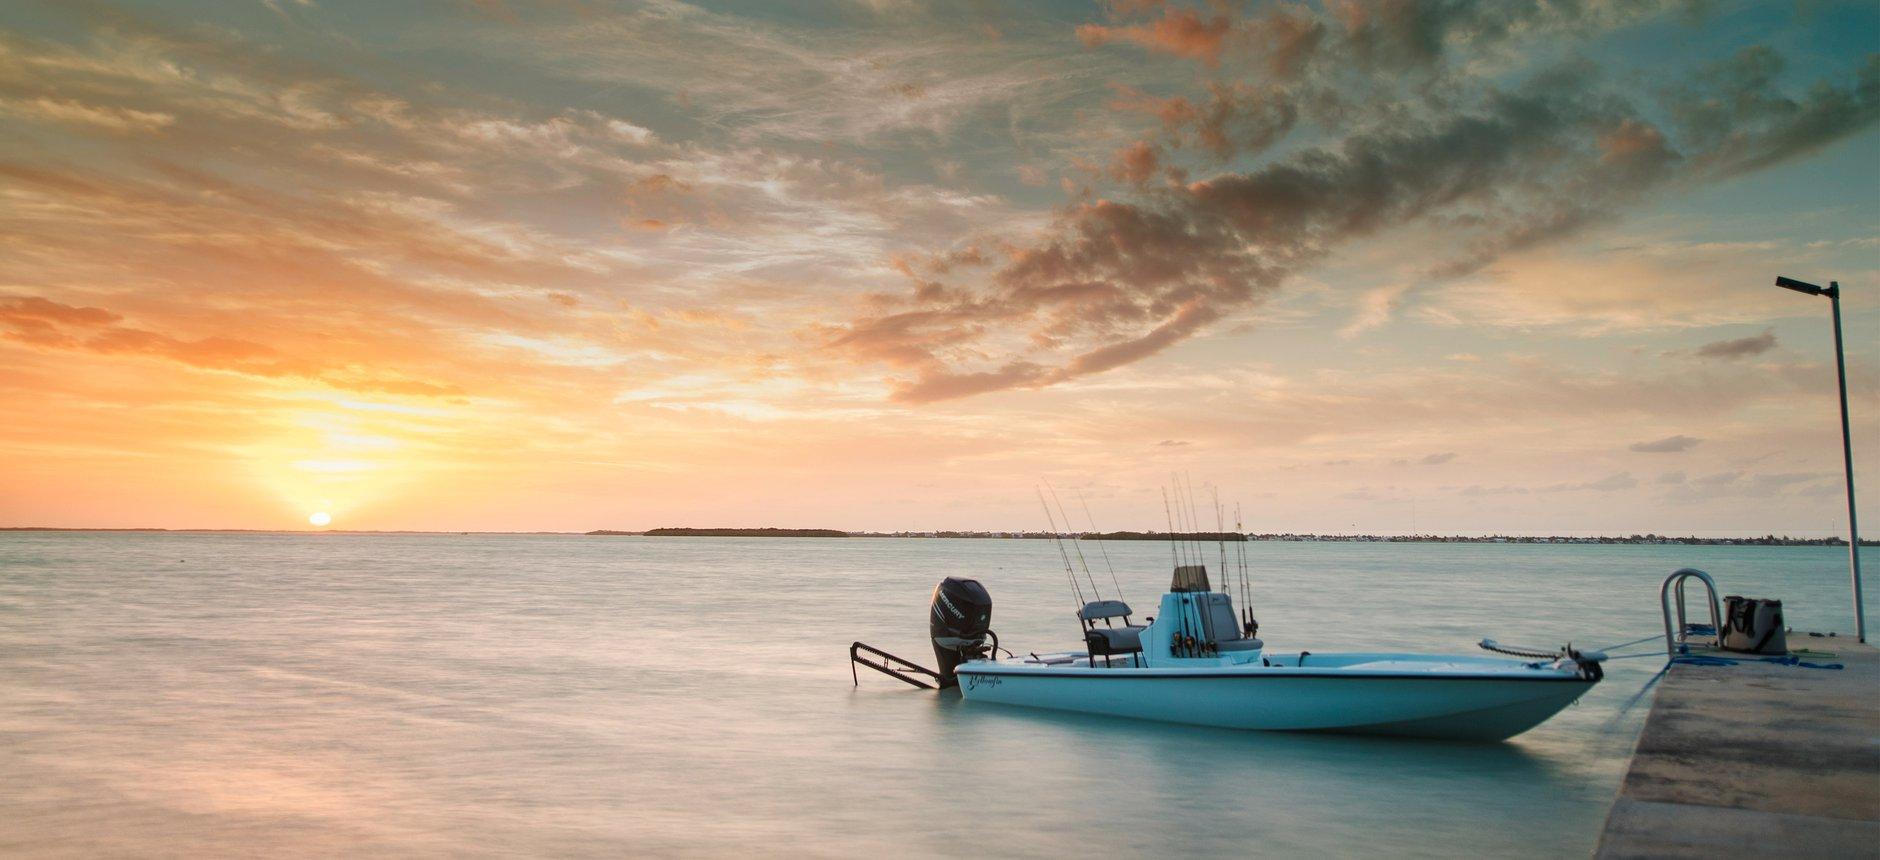 Merury Marine outboard docked at sunset